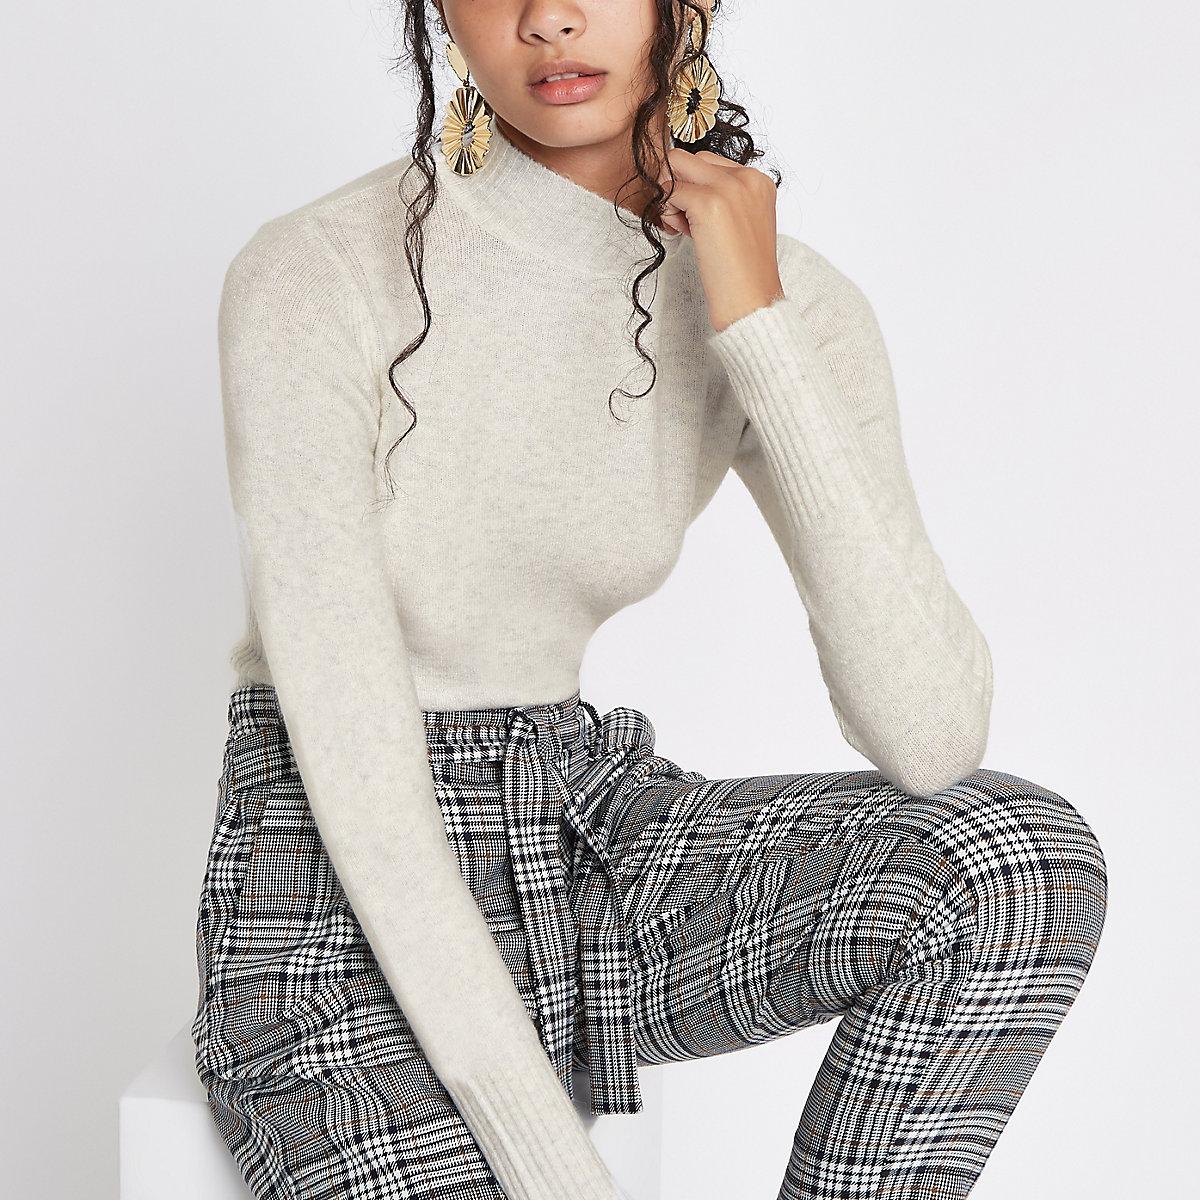 Cream knit turtle neck sweater